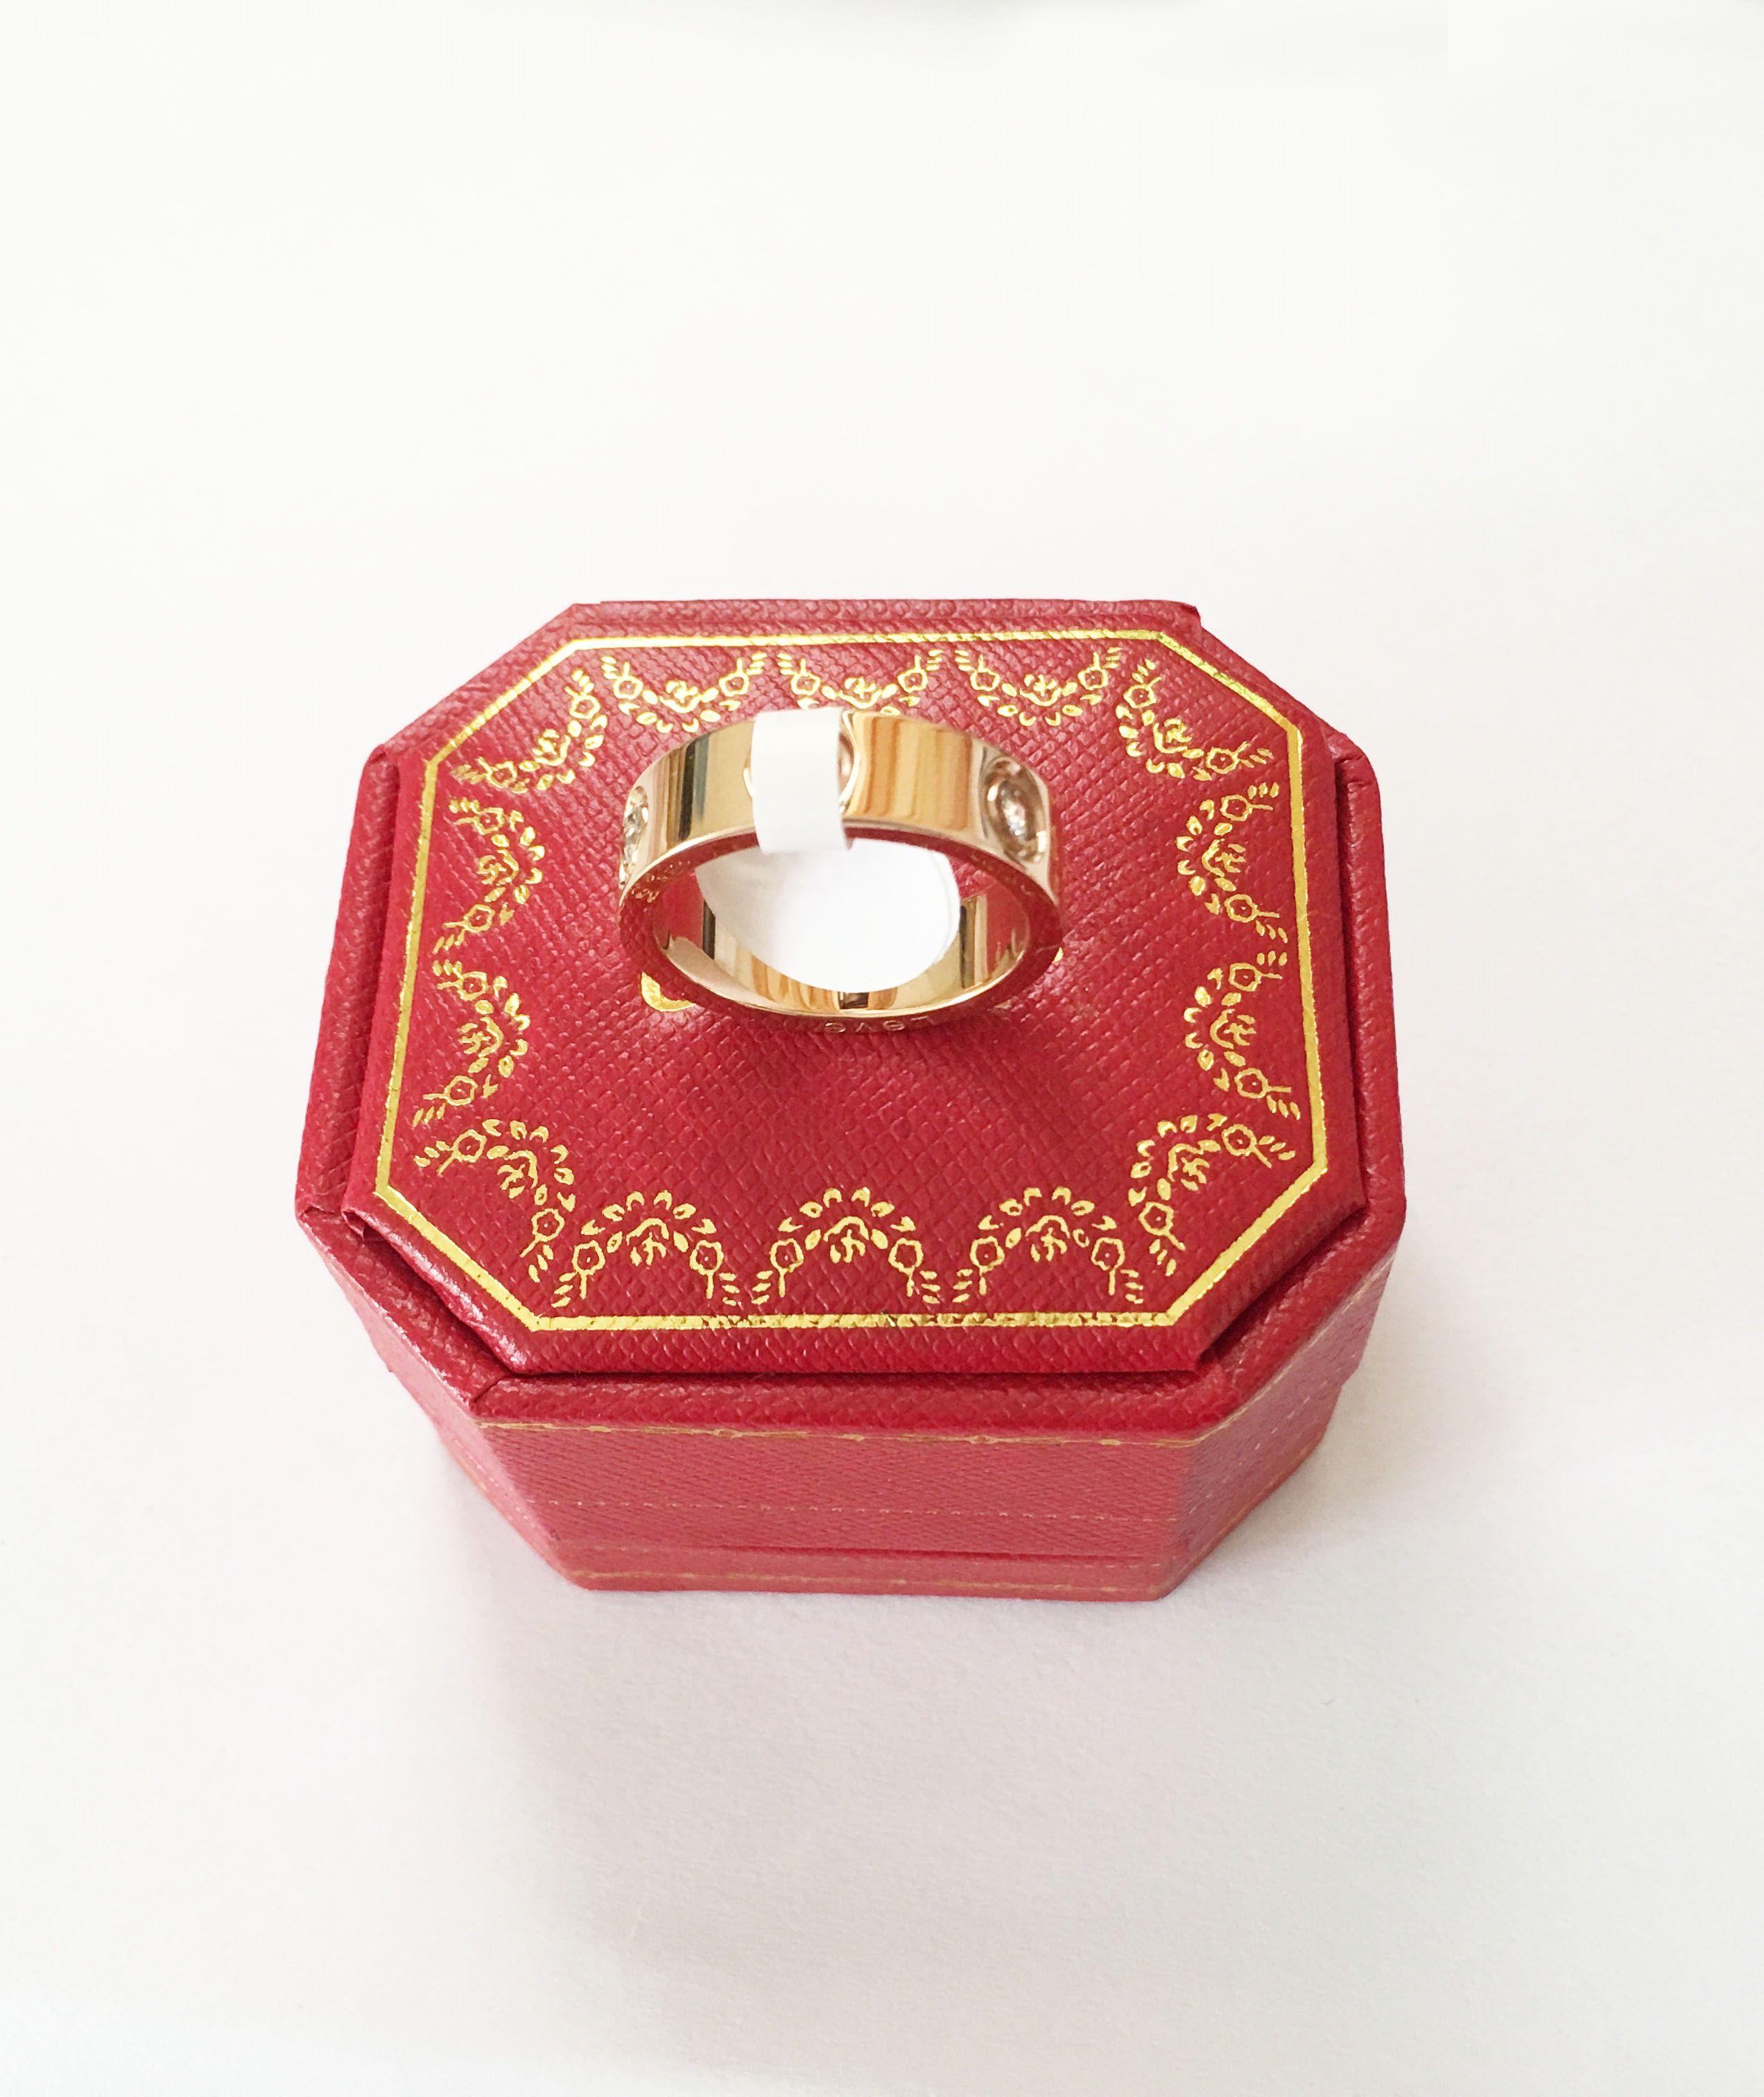 Grosshandel Liebe Ringe Fur Frauen Luxus Zirkonia Rose Gold Silber